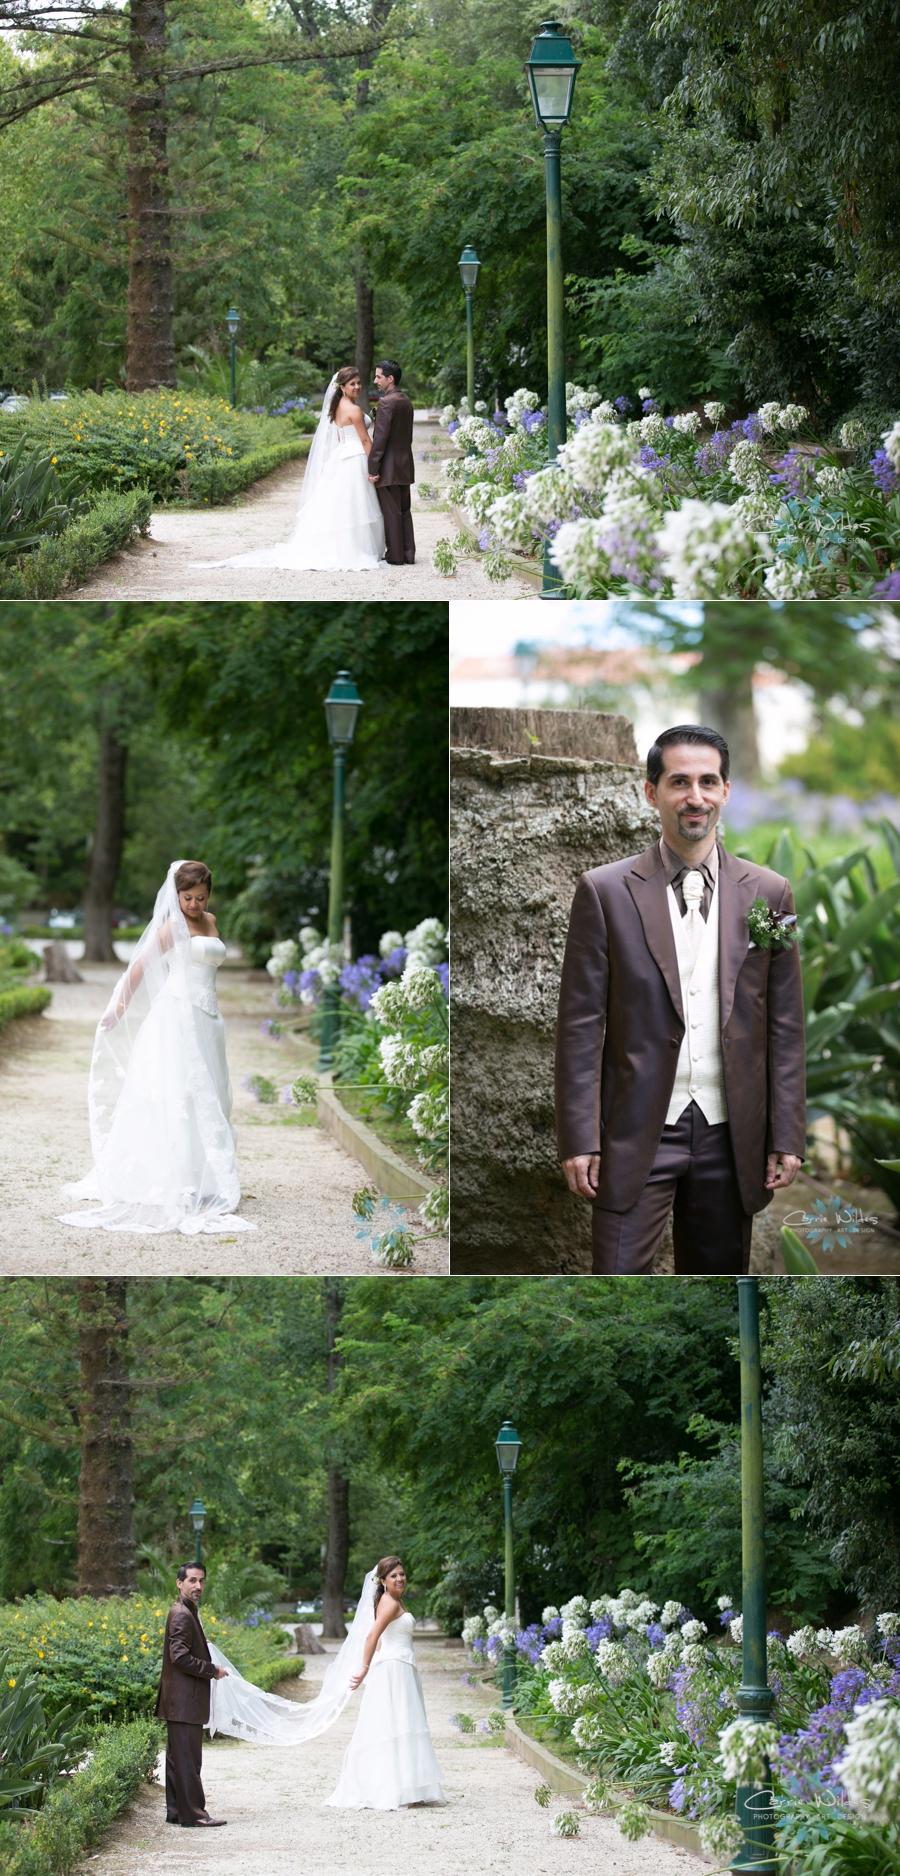 8_3_15 Portugal Wedding Palacio de Mafra_0106.jpg